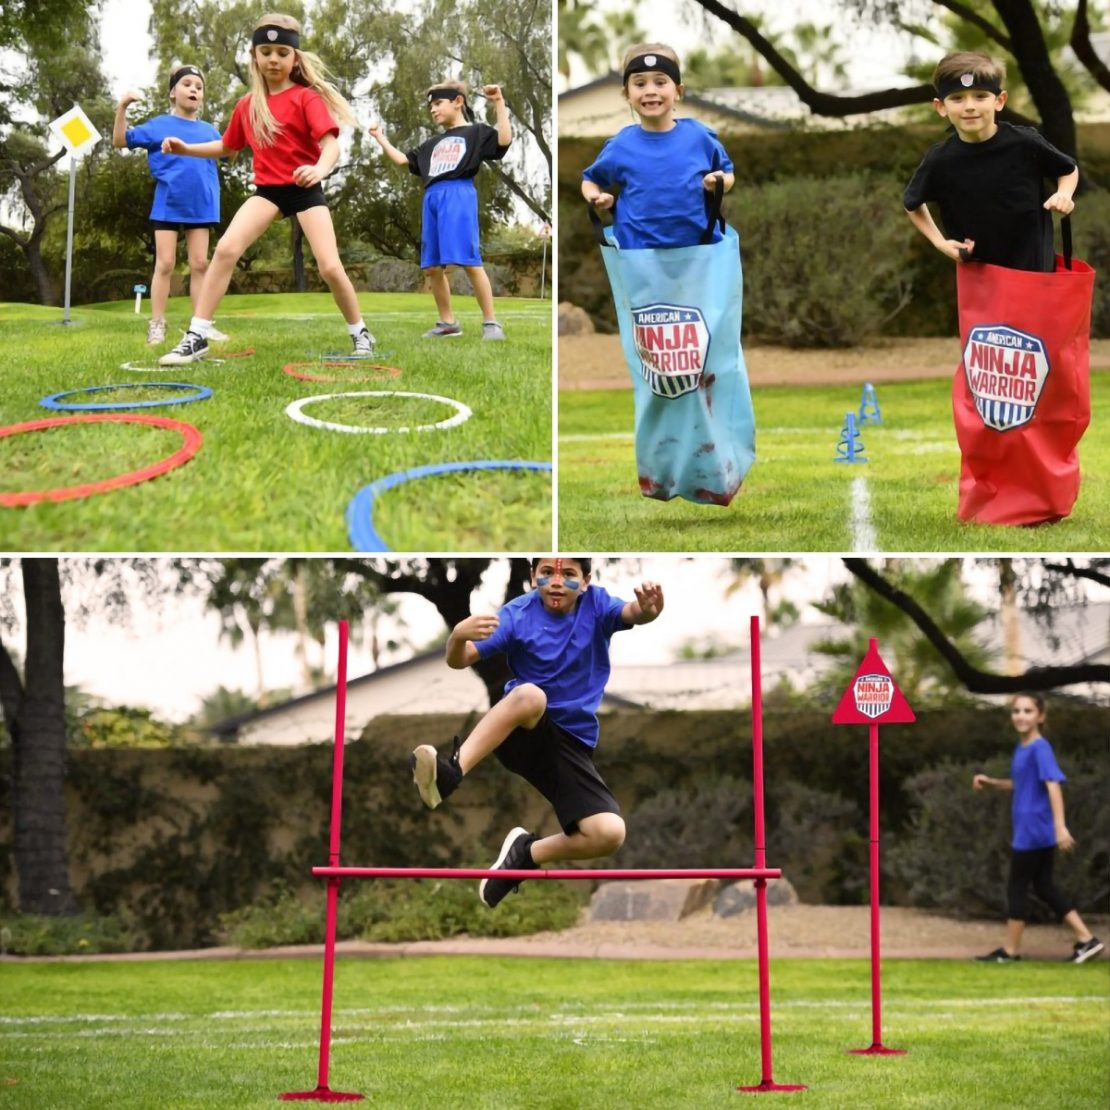 American Ninja Warrior Obstacle Race Set